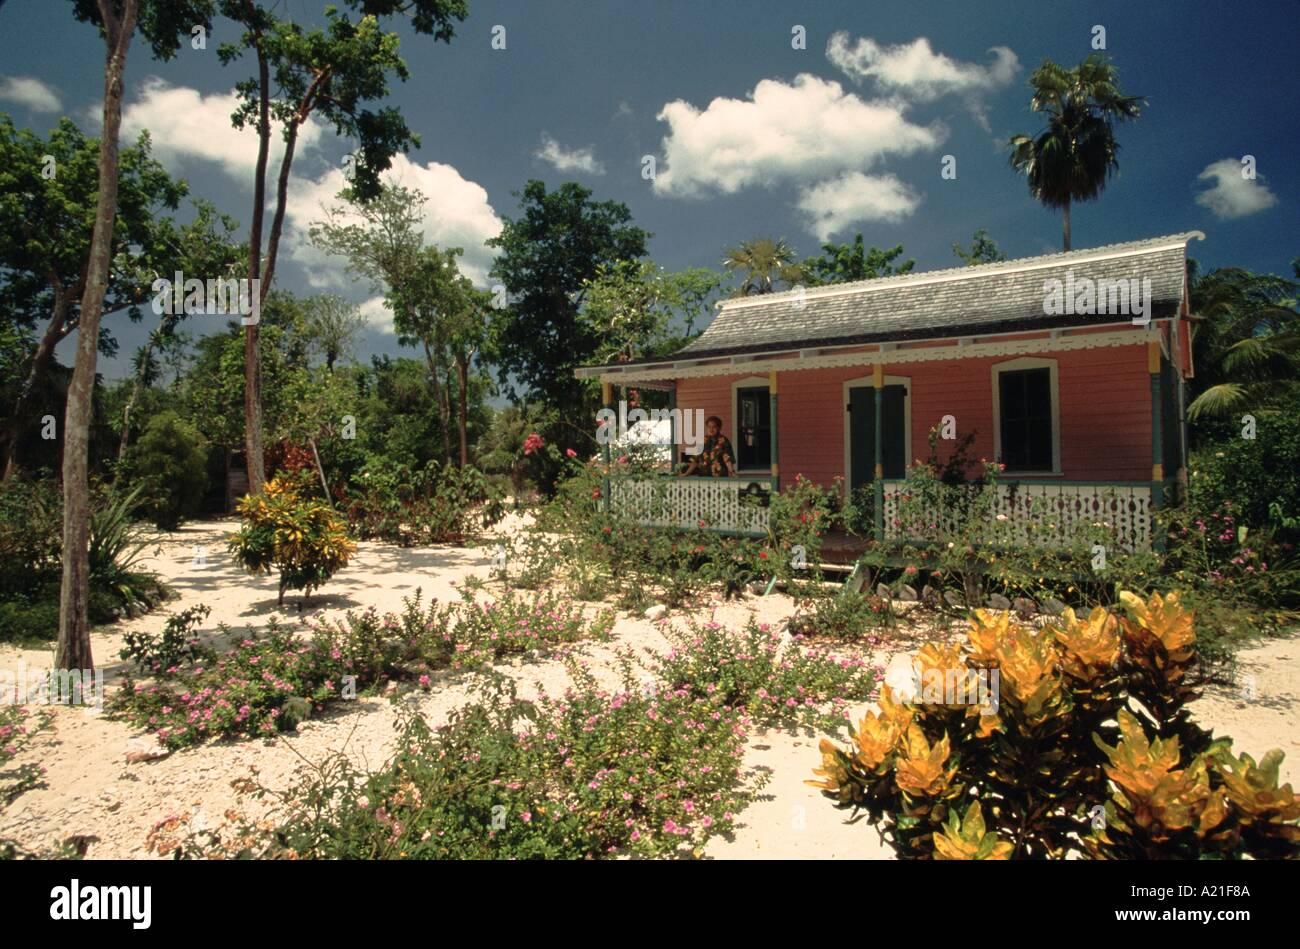 North End Rankin House and Sand Garden Queen Elizabeth II Botanical Gardens Grand Cayman Caymen Islands Caribbean J Greenberg - Stock Image